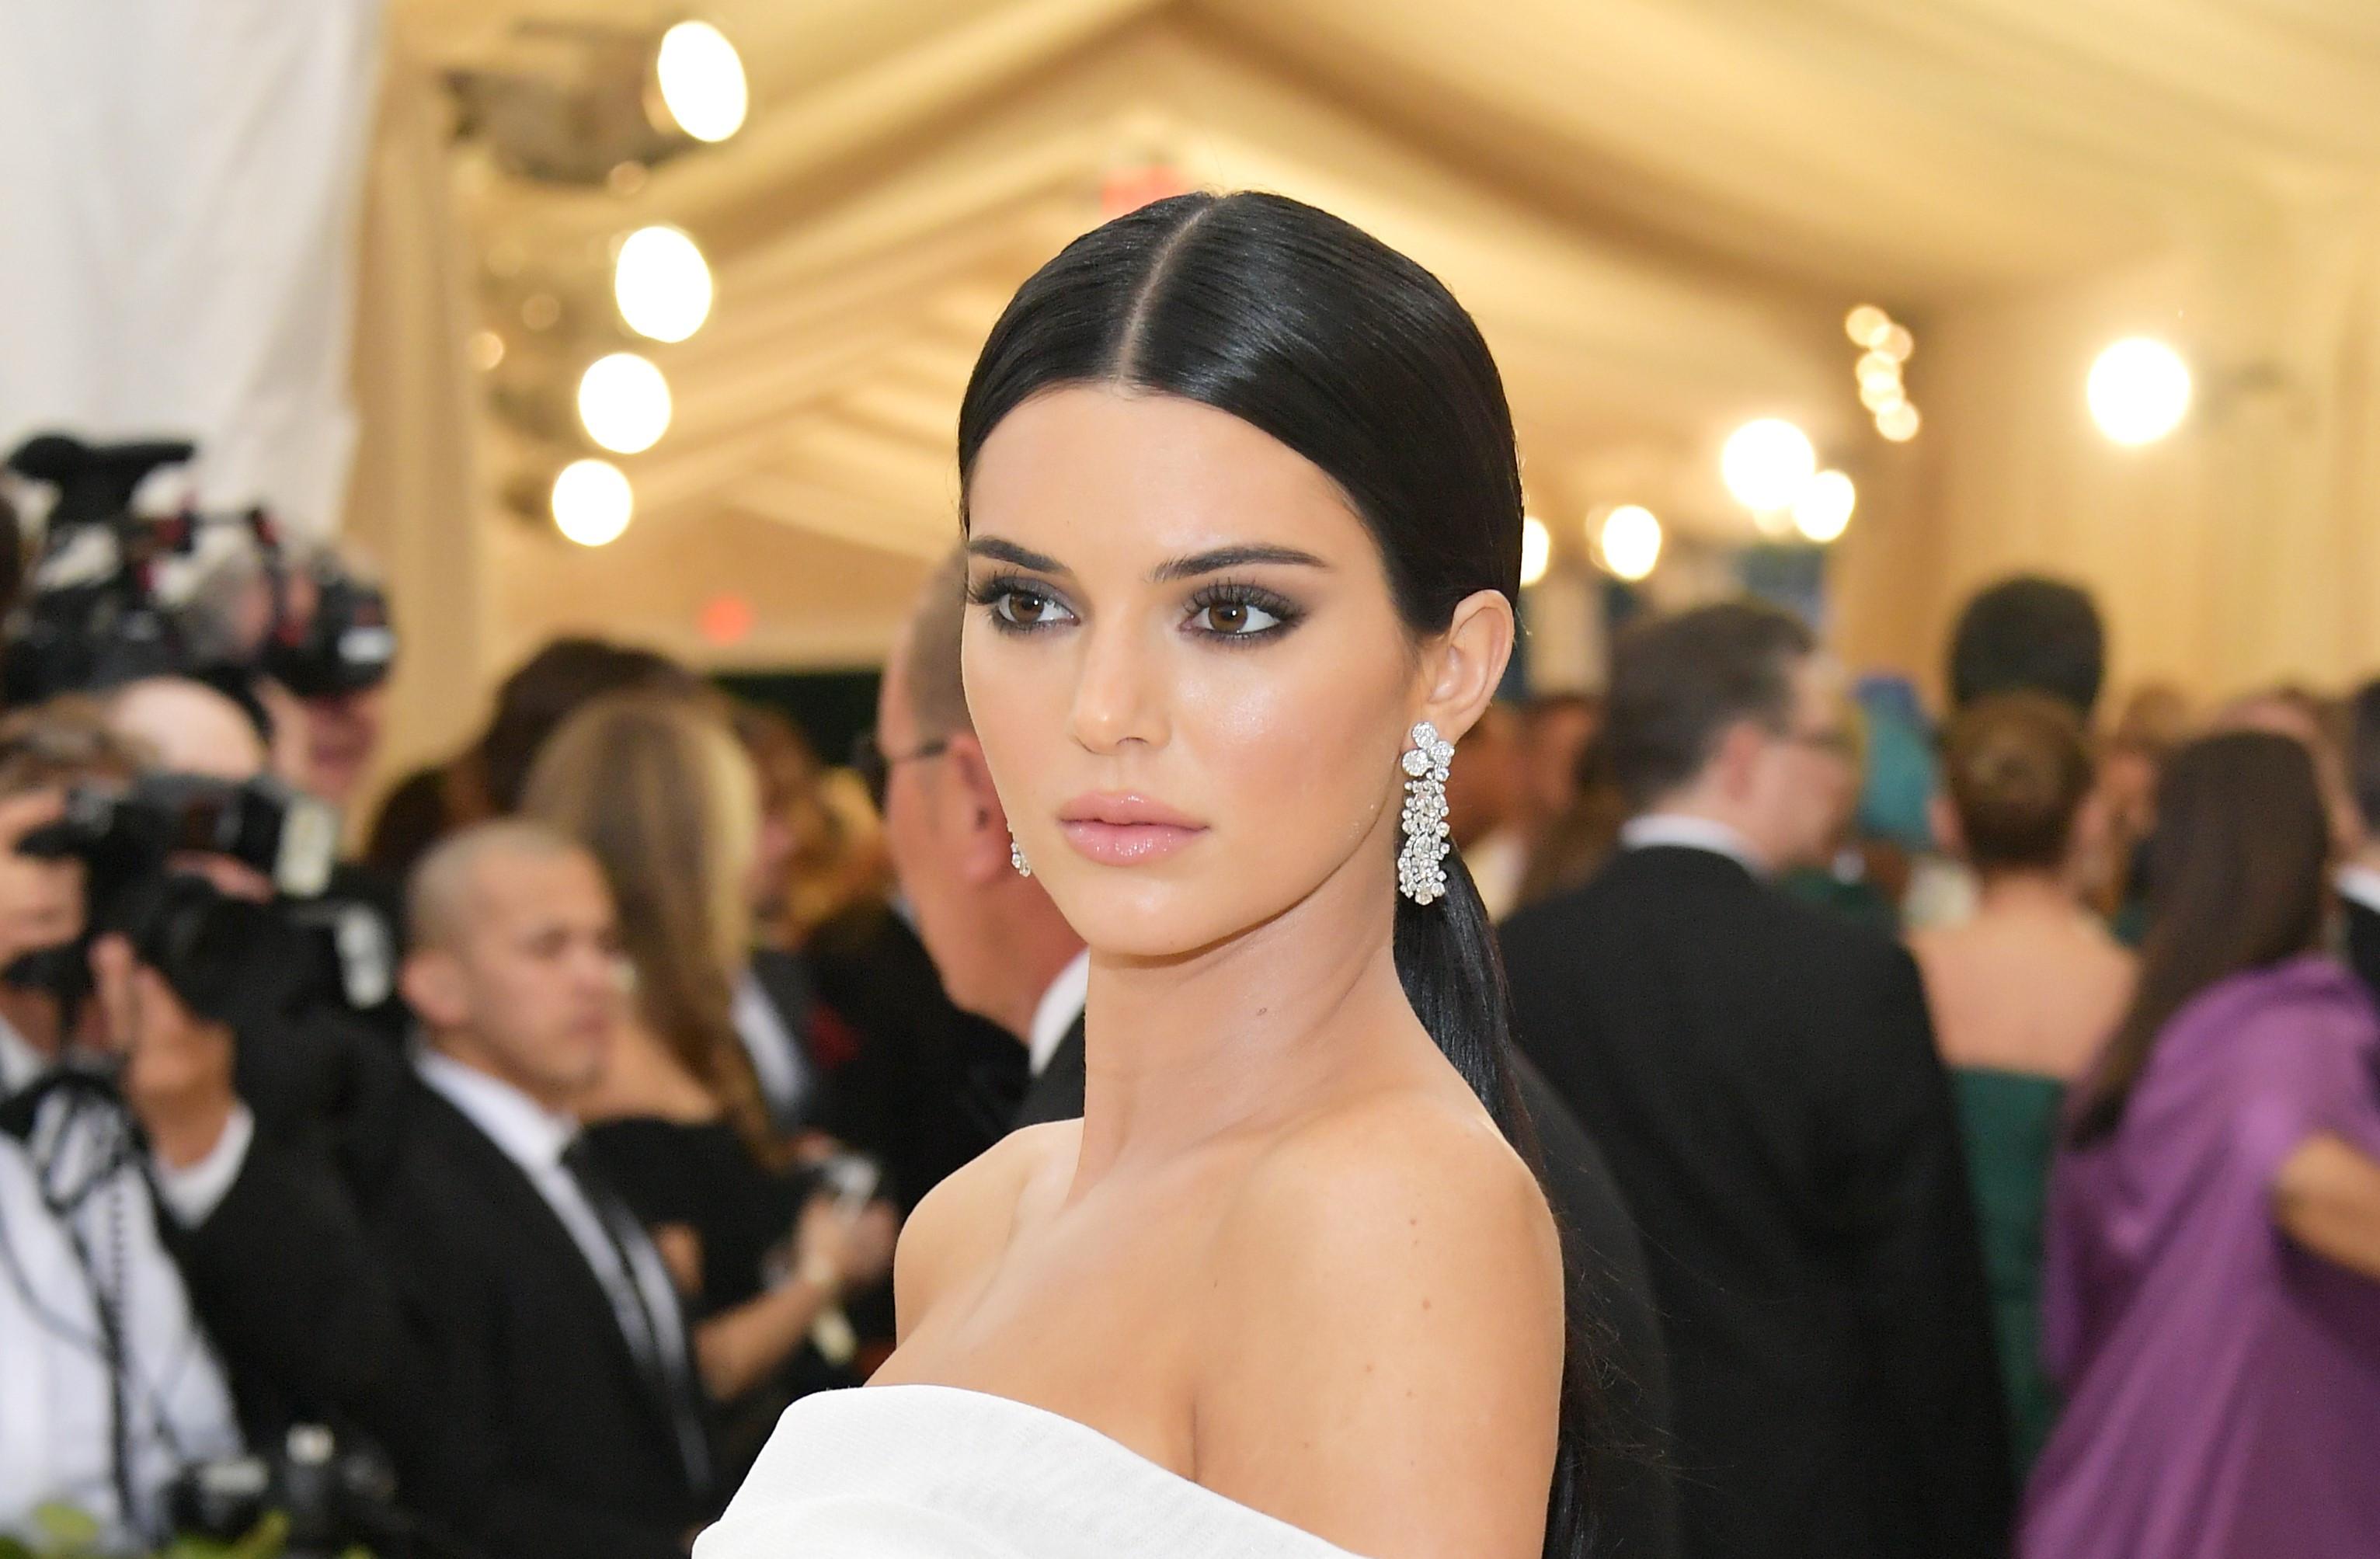 Após posar nua, Kendall Jenner surge com novo visual